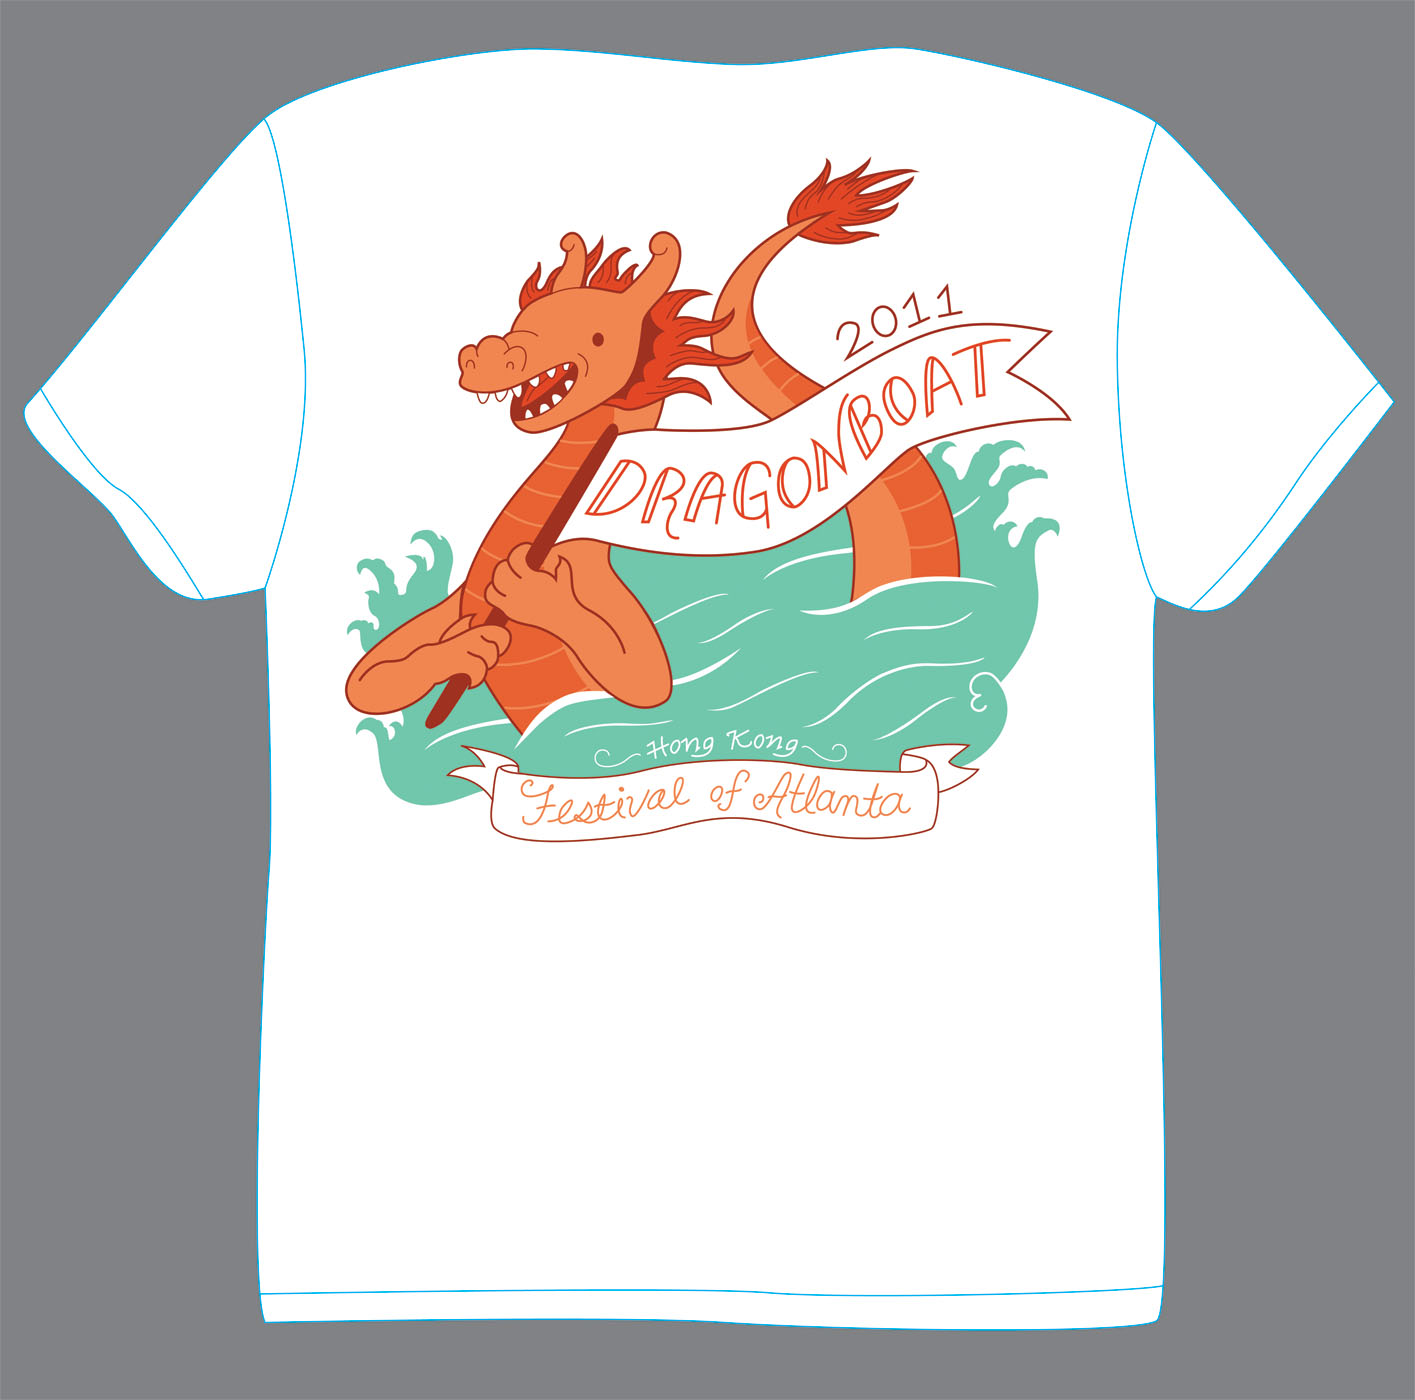 Heather lund illustration dragonboat festival of atlanta for T shirt design festival